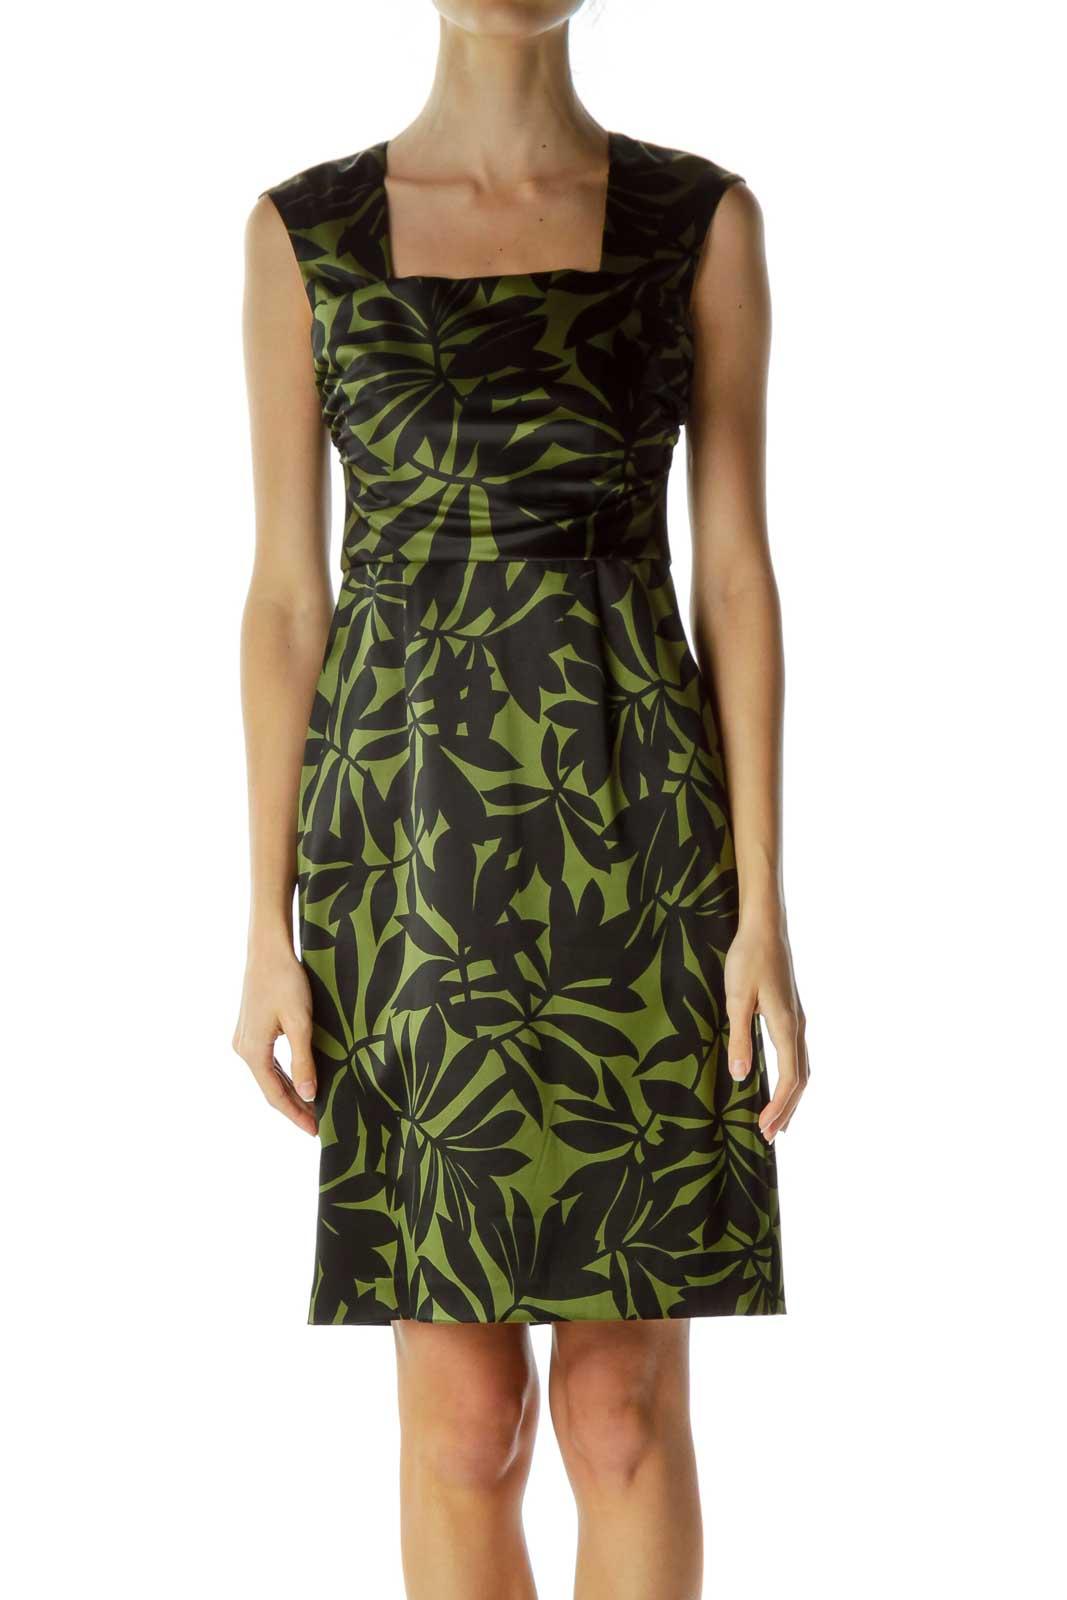 Green Leaf Print Sheath Dress Front